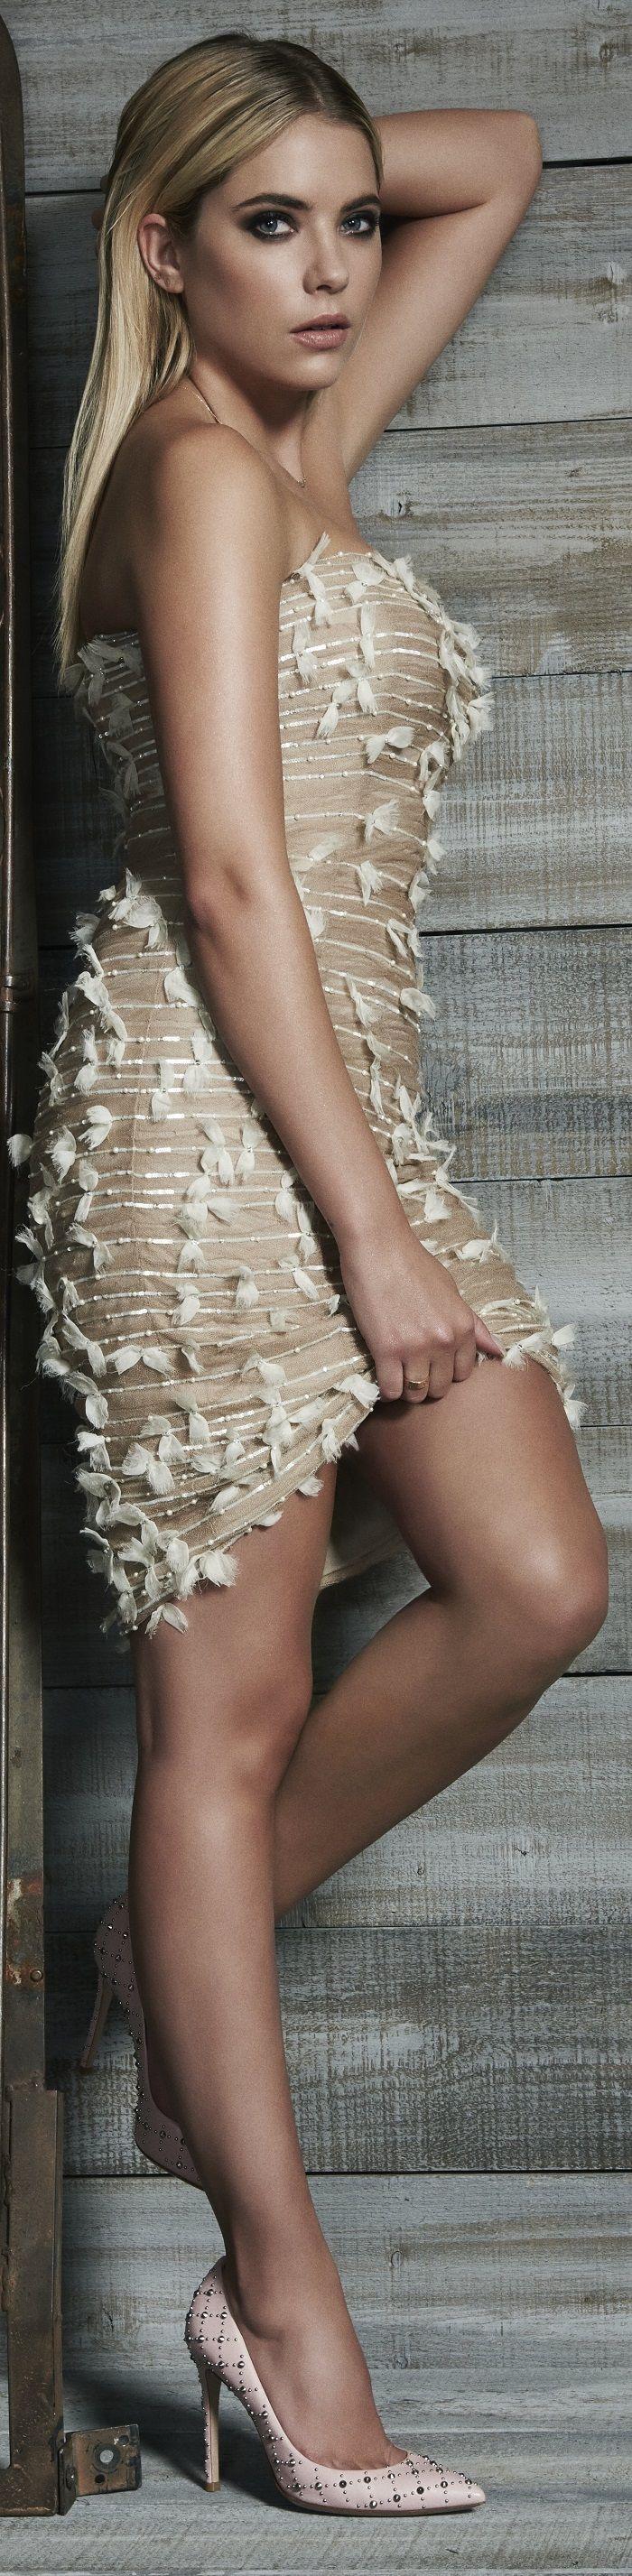 Ashley Benson - Photoshoot For Pretty Little Liars Season 6 Sept 2015